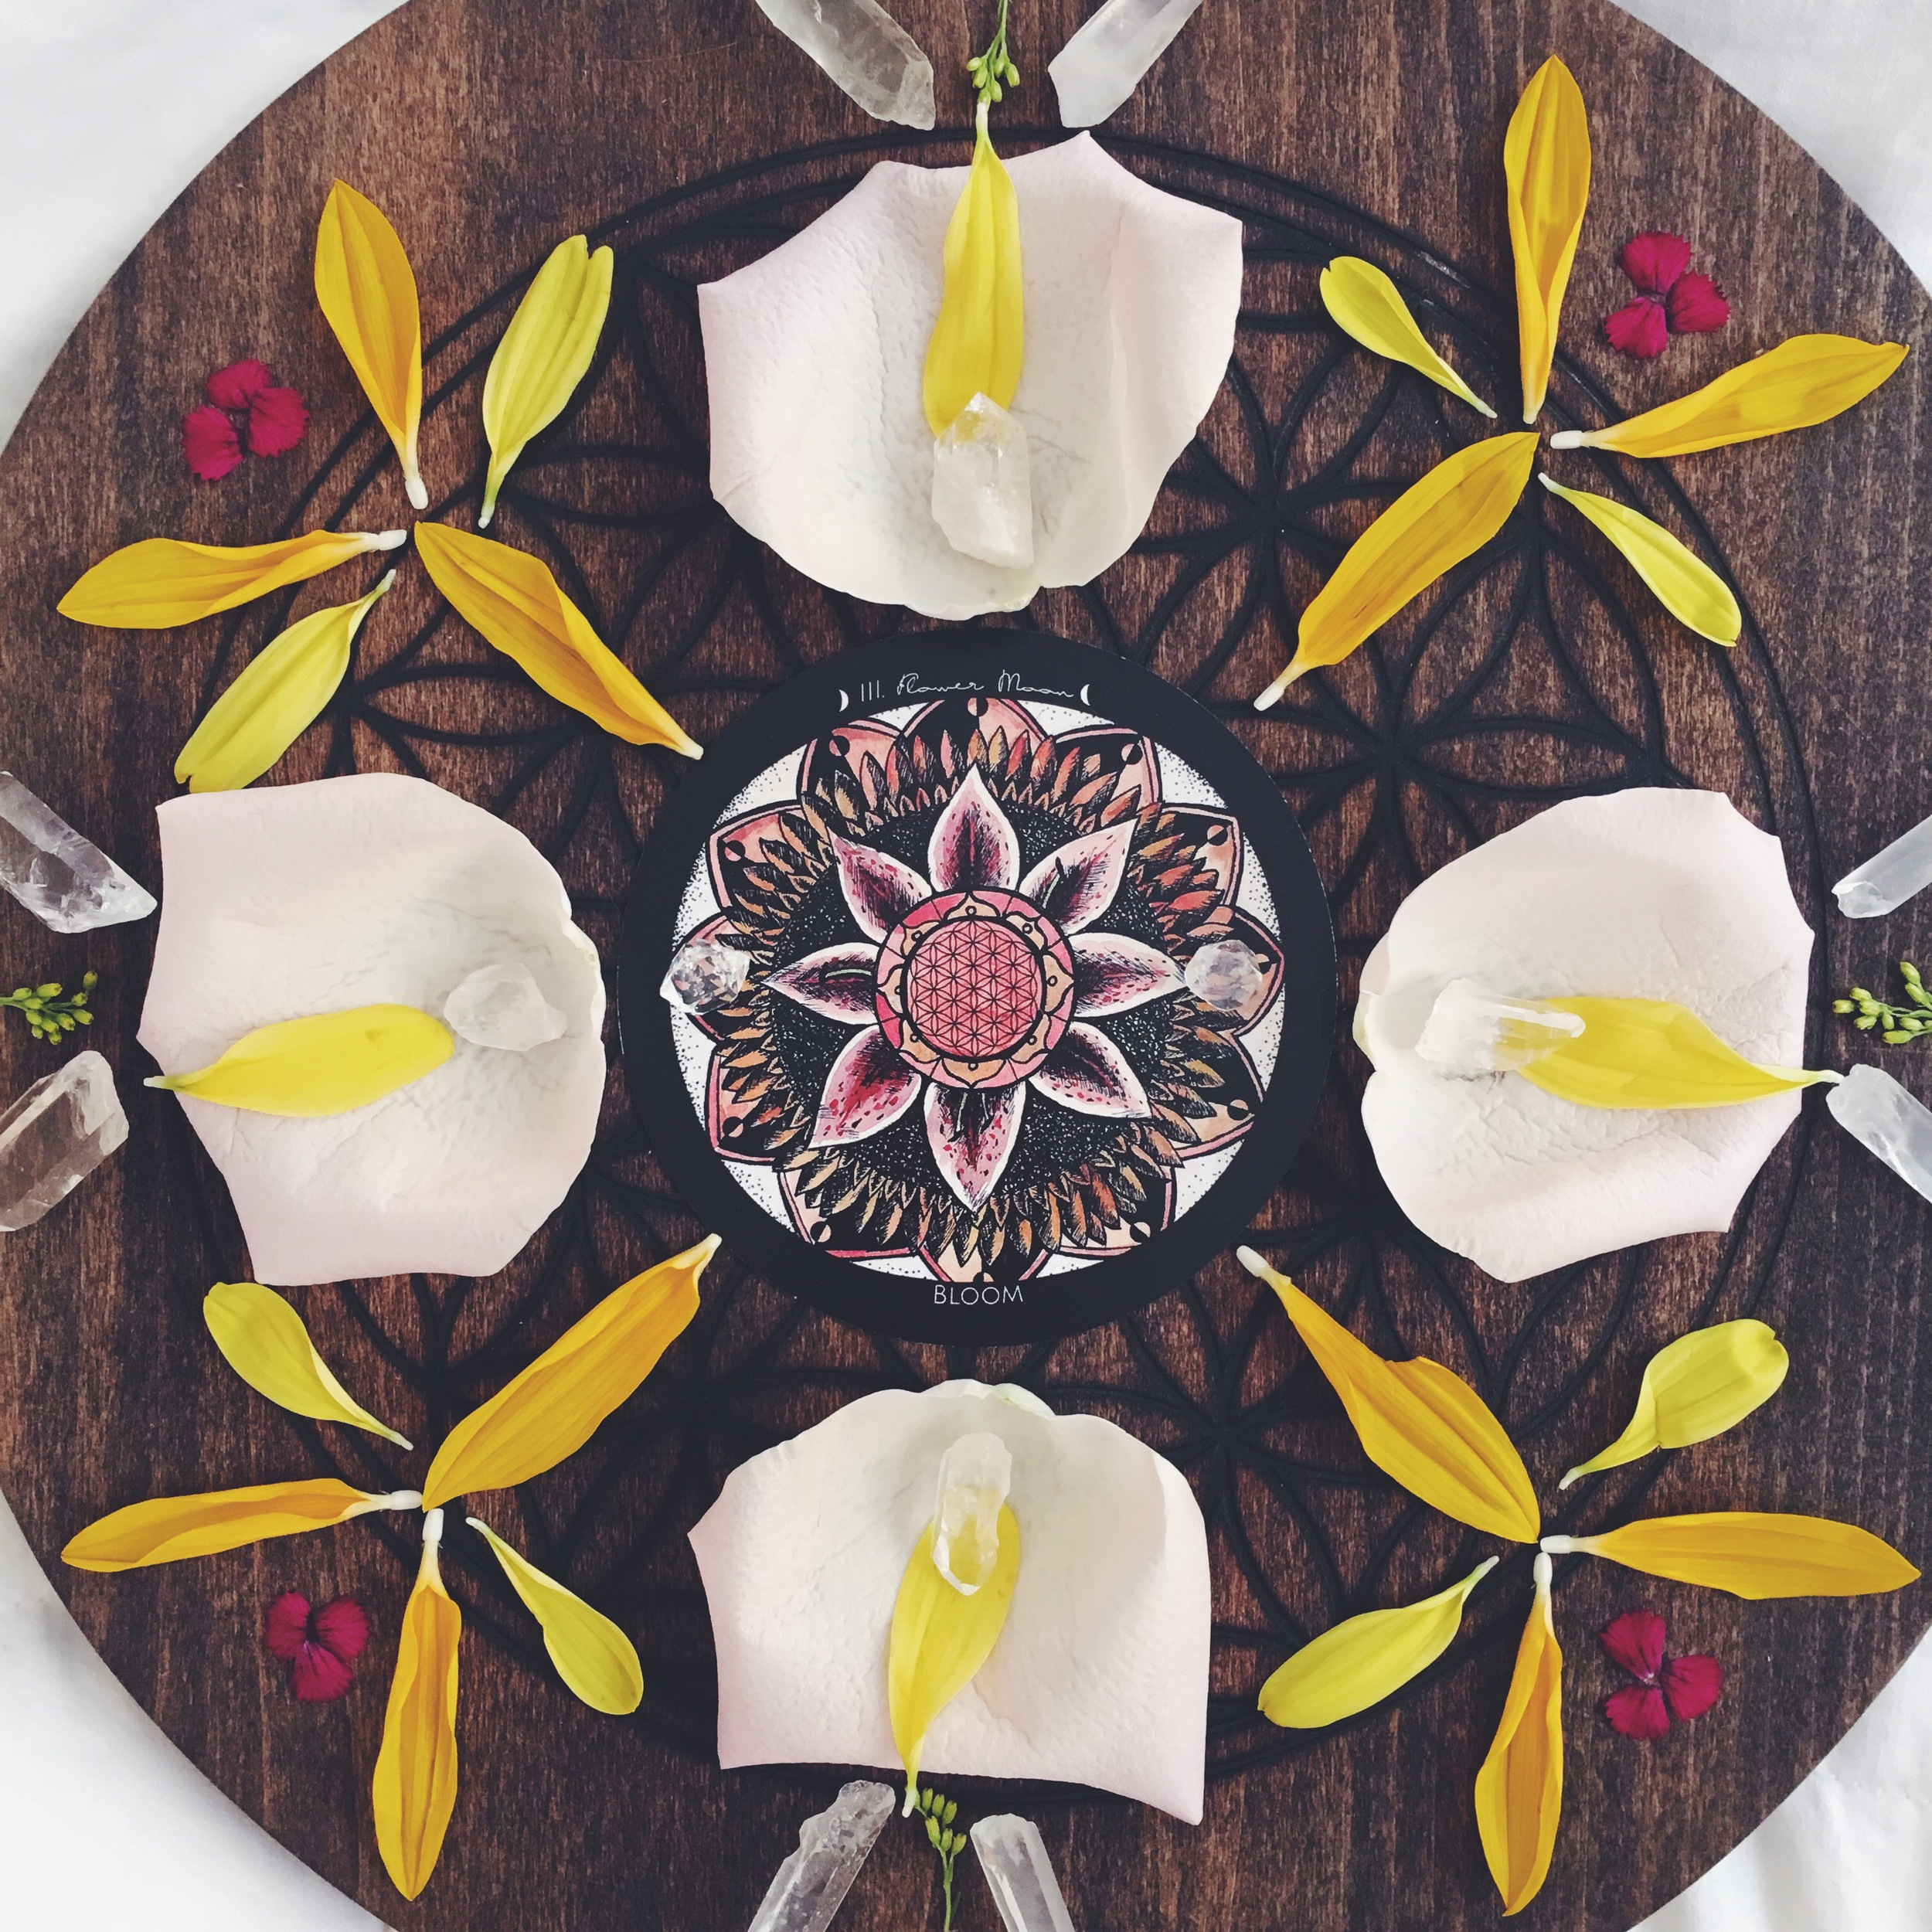 Flower Moondala - Spirit de la lune